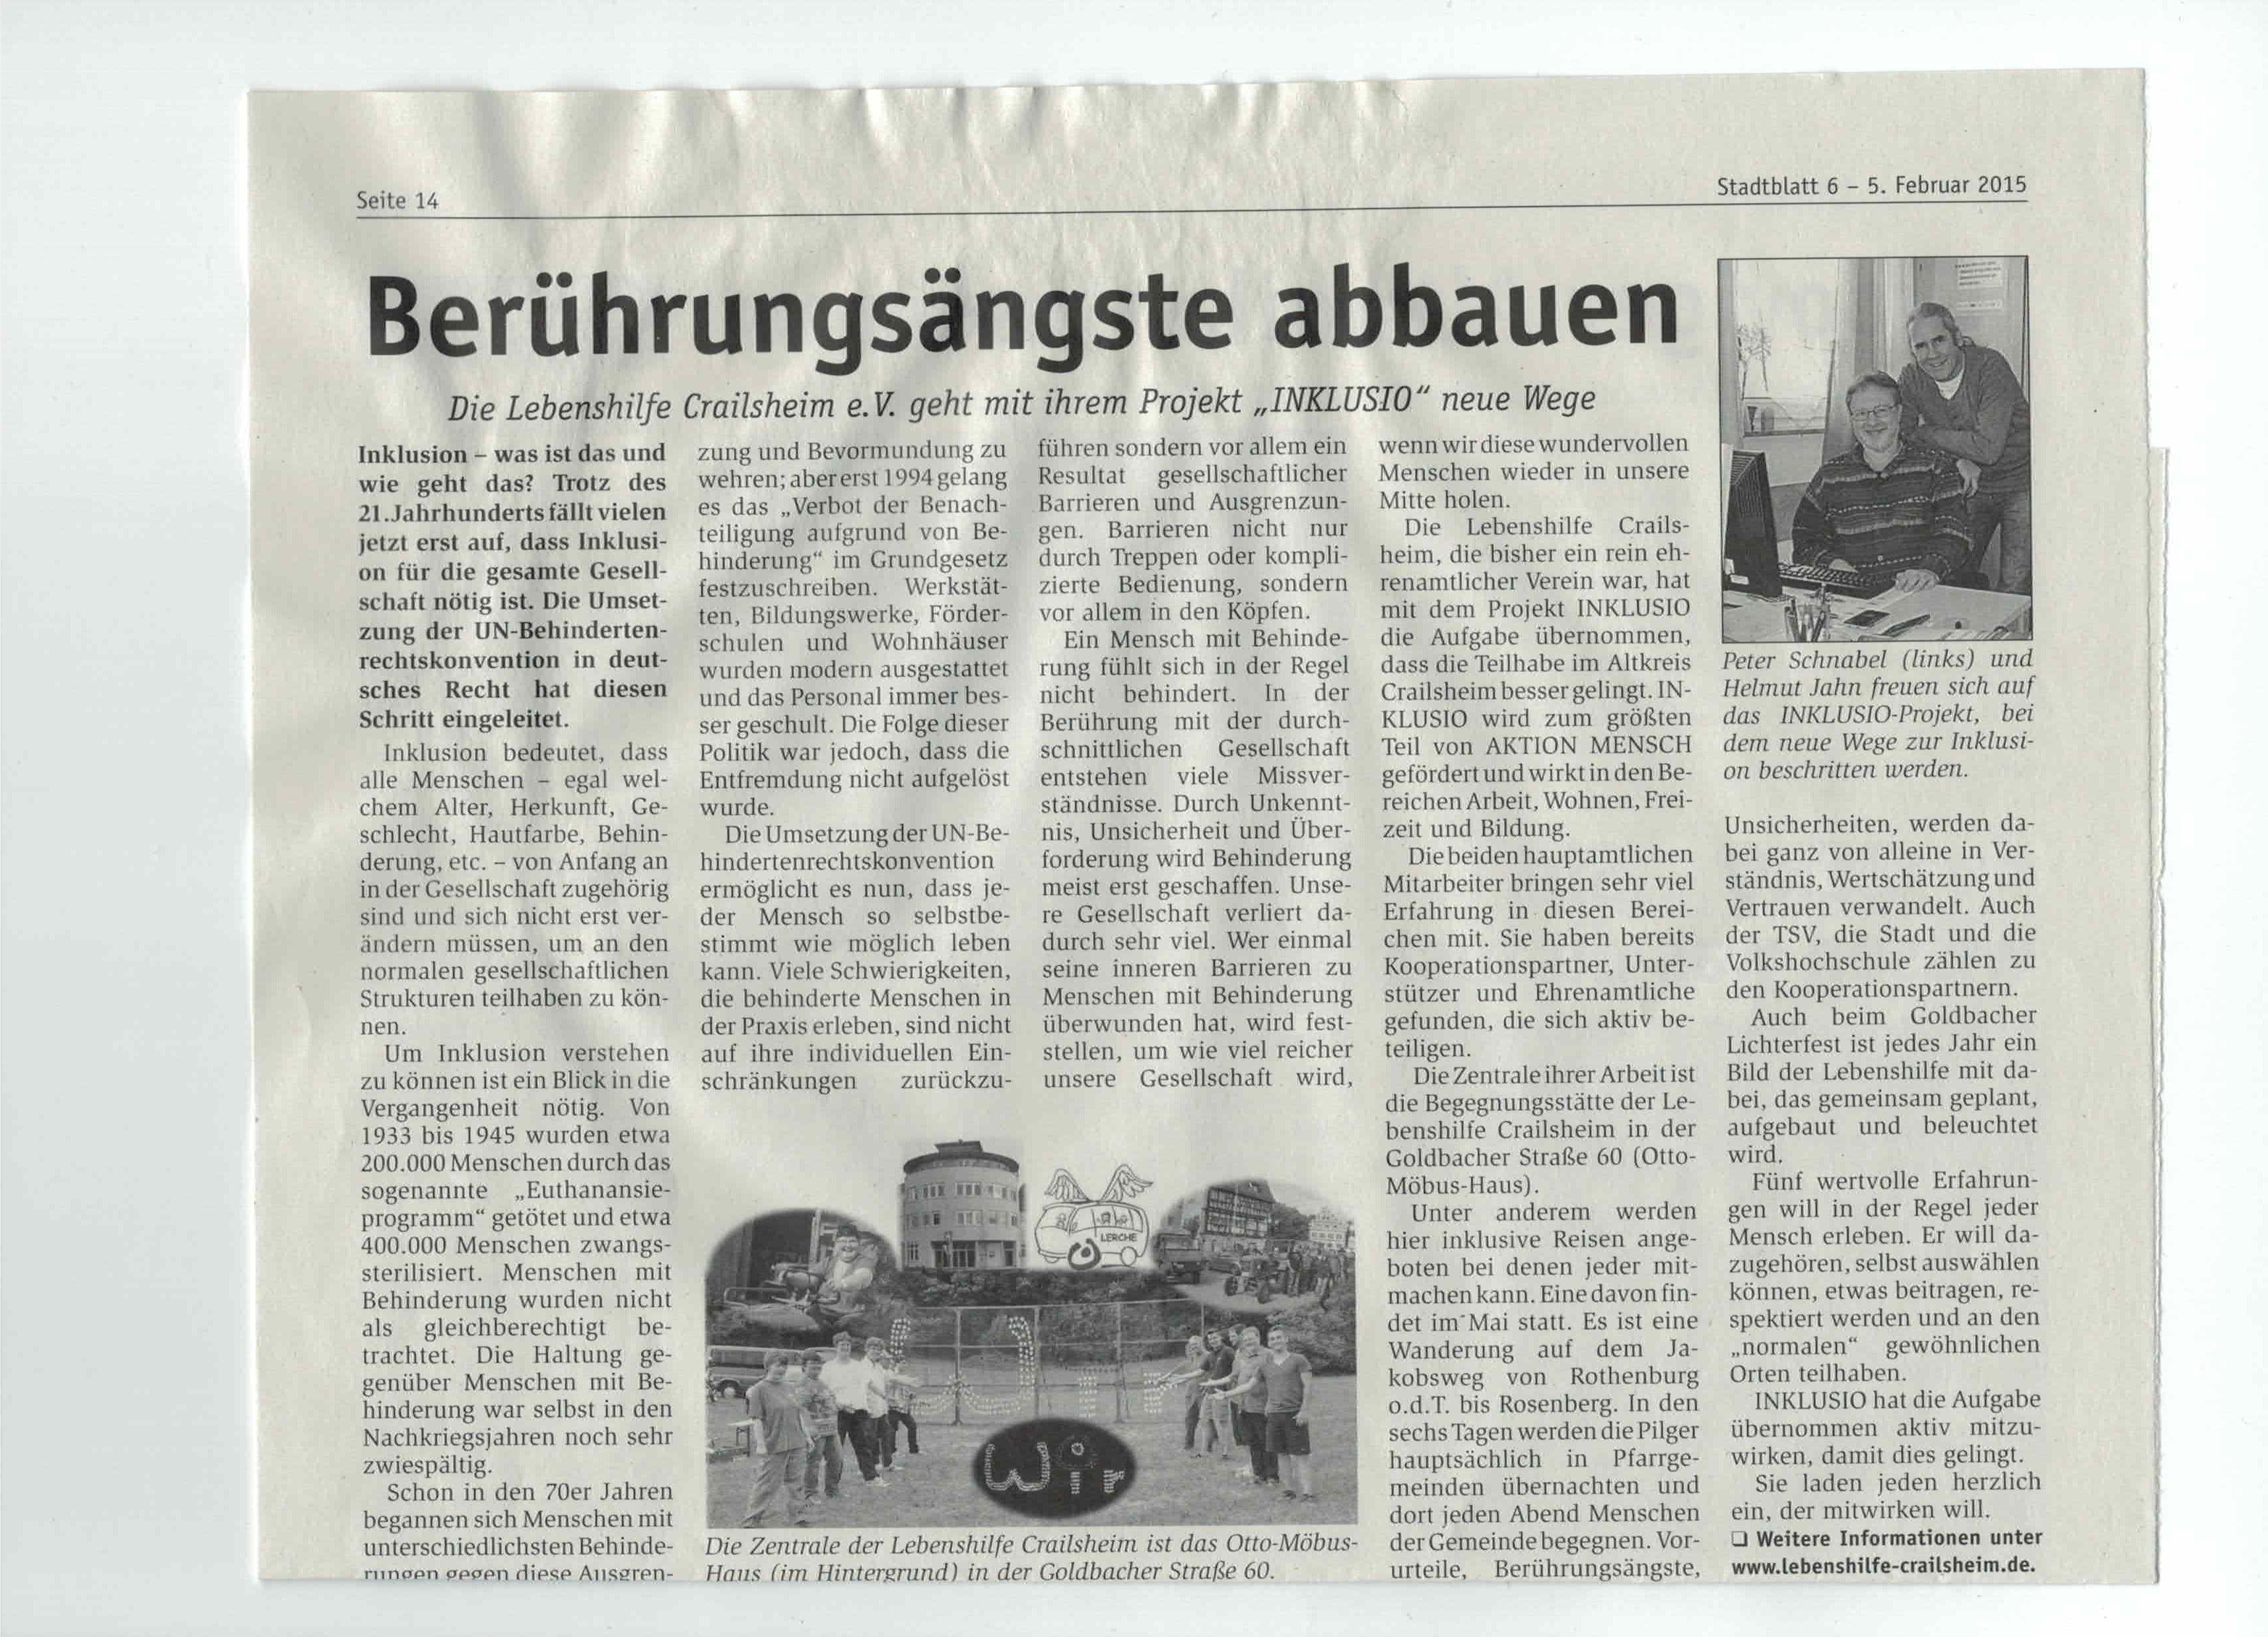 Stadtblatt 2015-01.jpeg - 1.74 MB